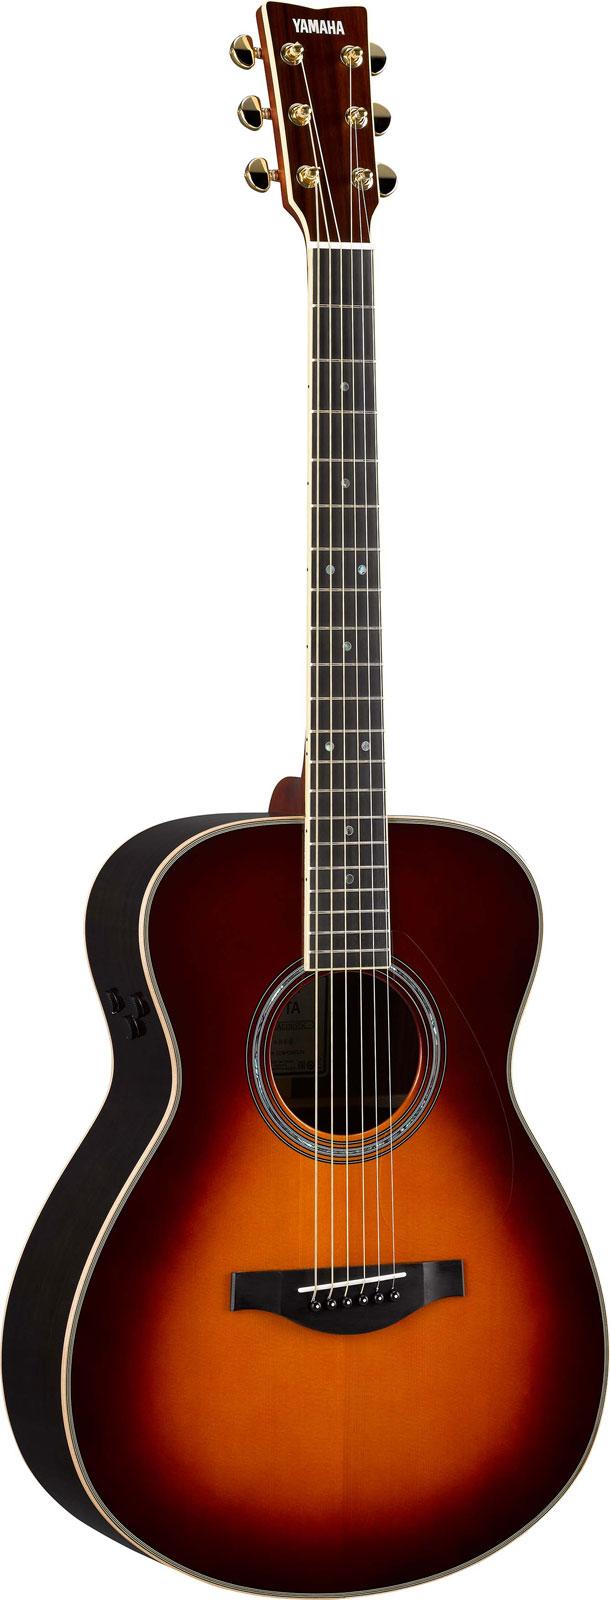 Guitare acoustique folk 3 4 yamaha jr2 en housse namm for Housse guitare folk